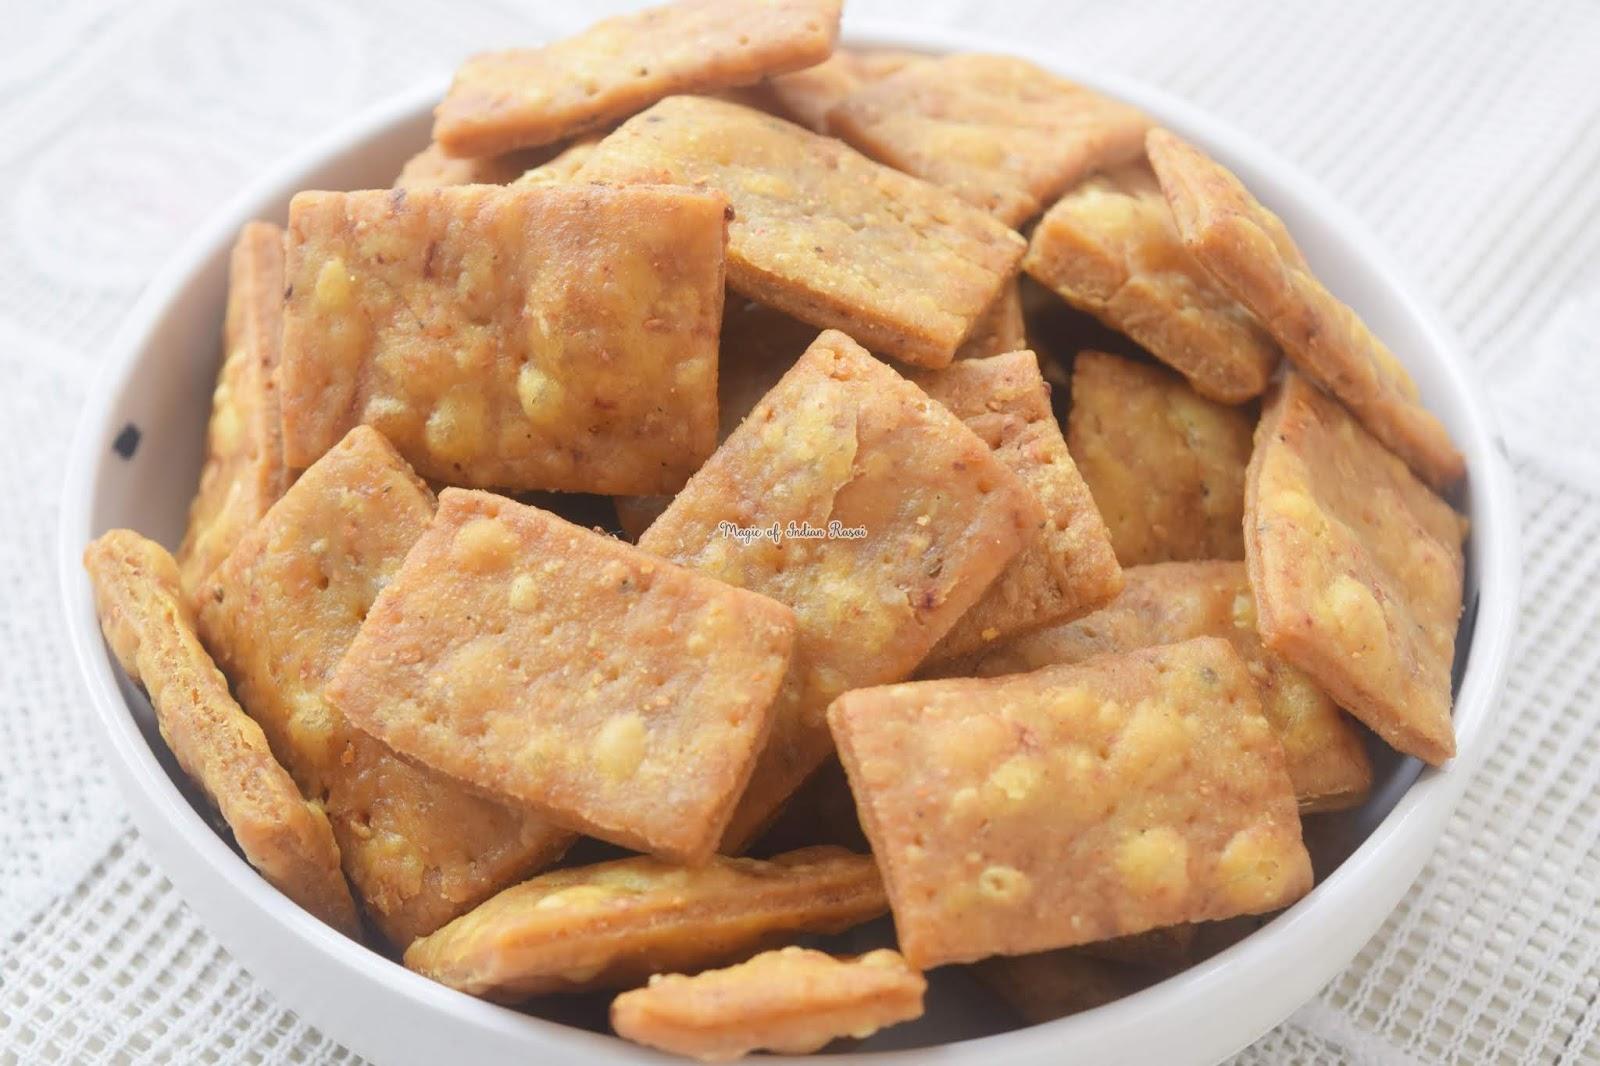 Farsi Masala Puri - Khasta Spicy Mathri Recipe - फरसी मसाला पूरी रेसिपी - Priya R - Magic of Indian Rasoi